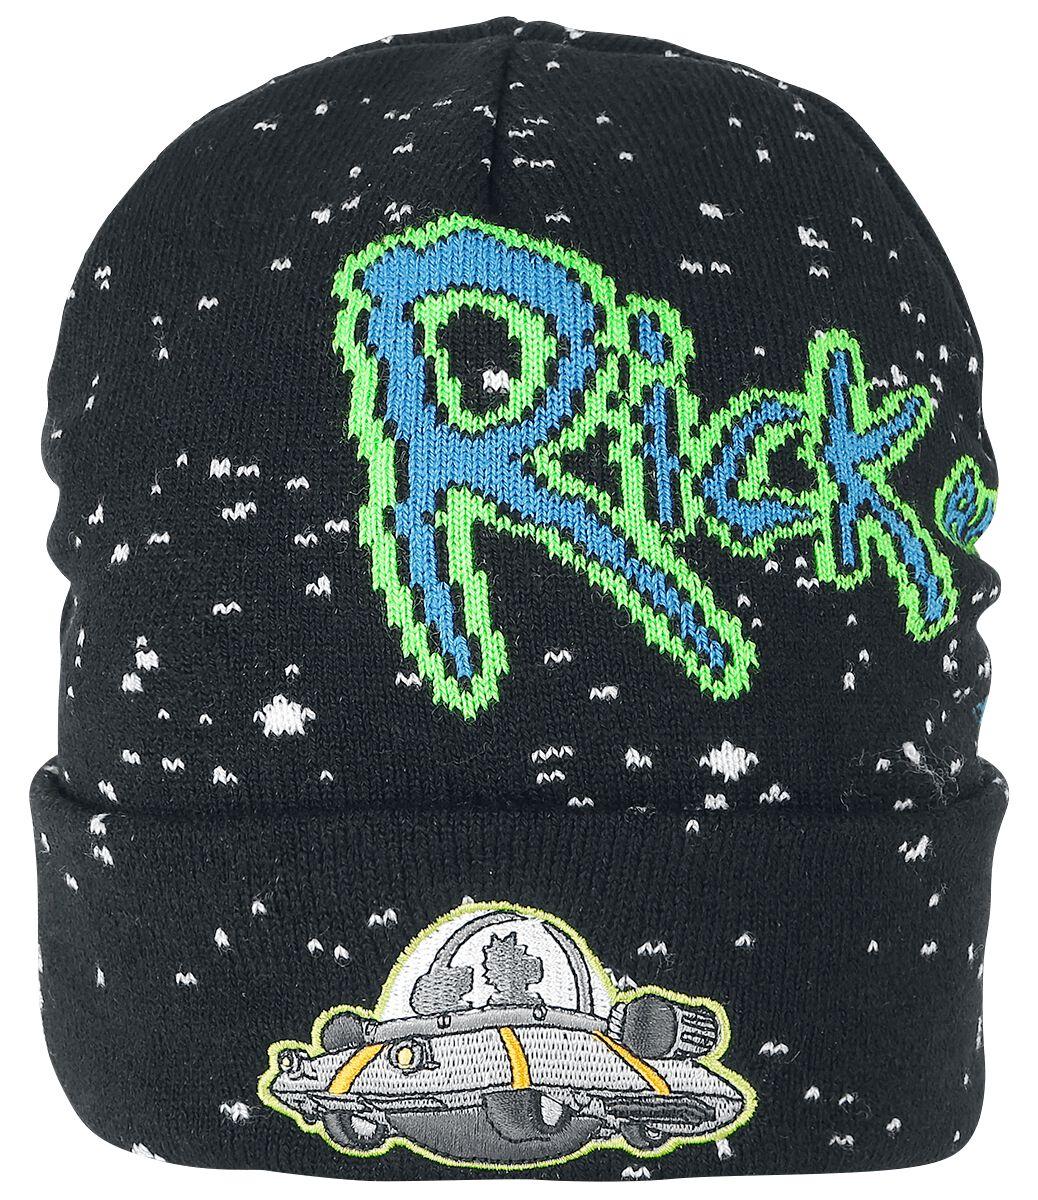 Rick and Morty Spaceship Gorro multicolor